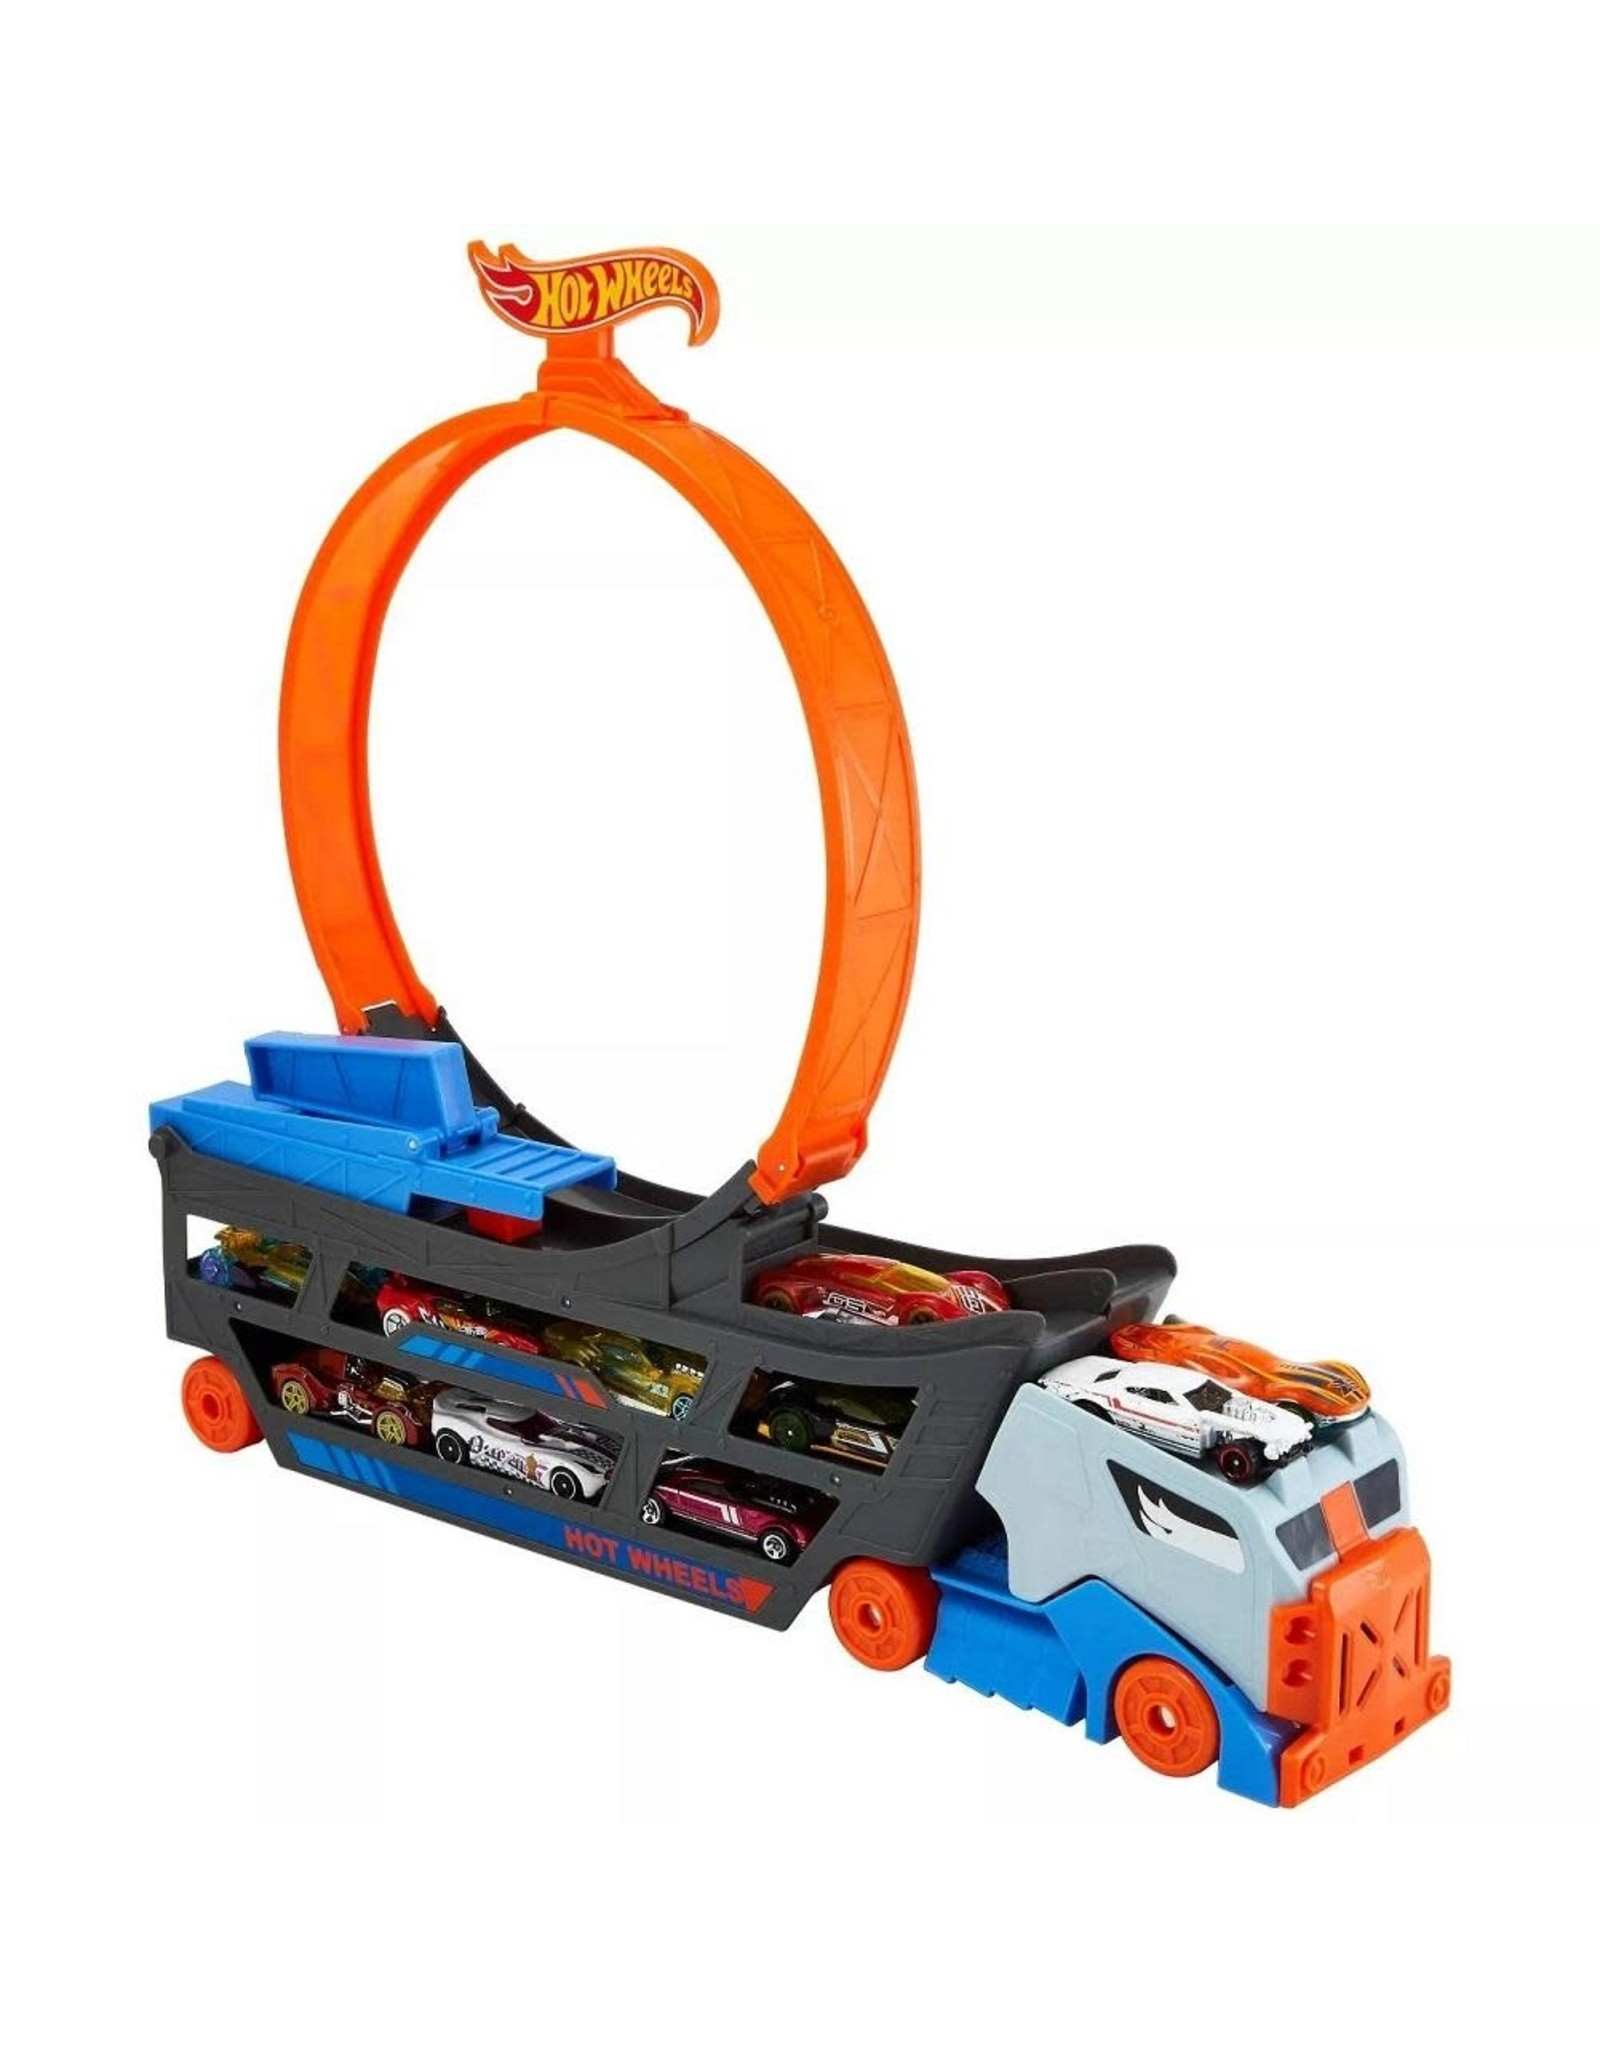 Hot Wheels Hot Wheels Stunt & Go Track Set